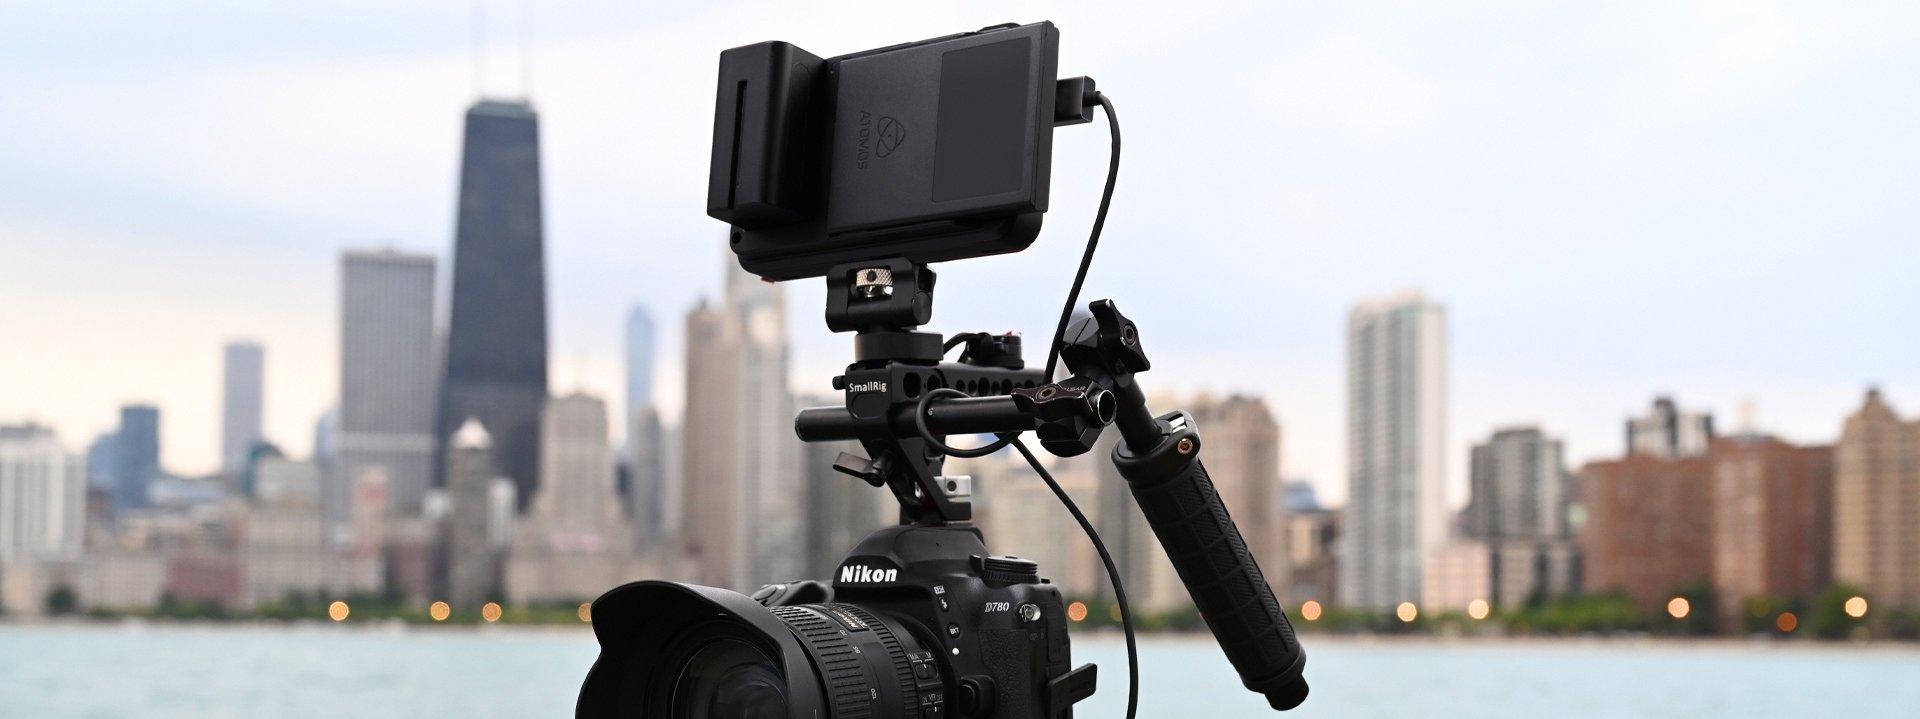 d780_4k_movie_recording--original.jpg